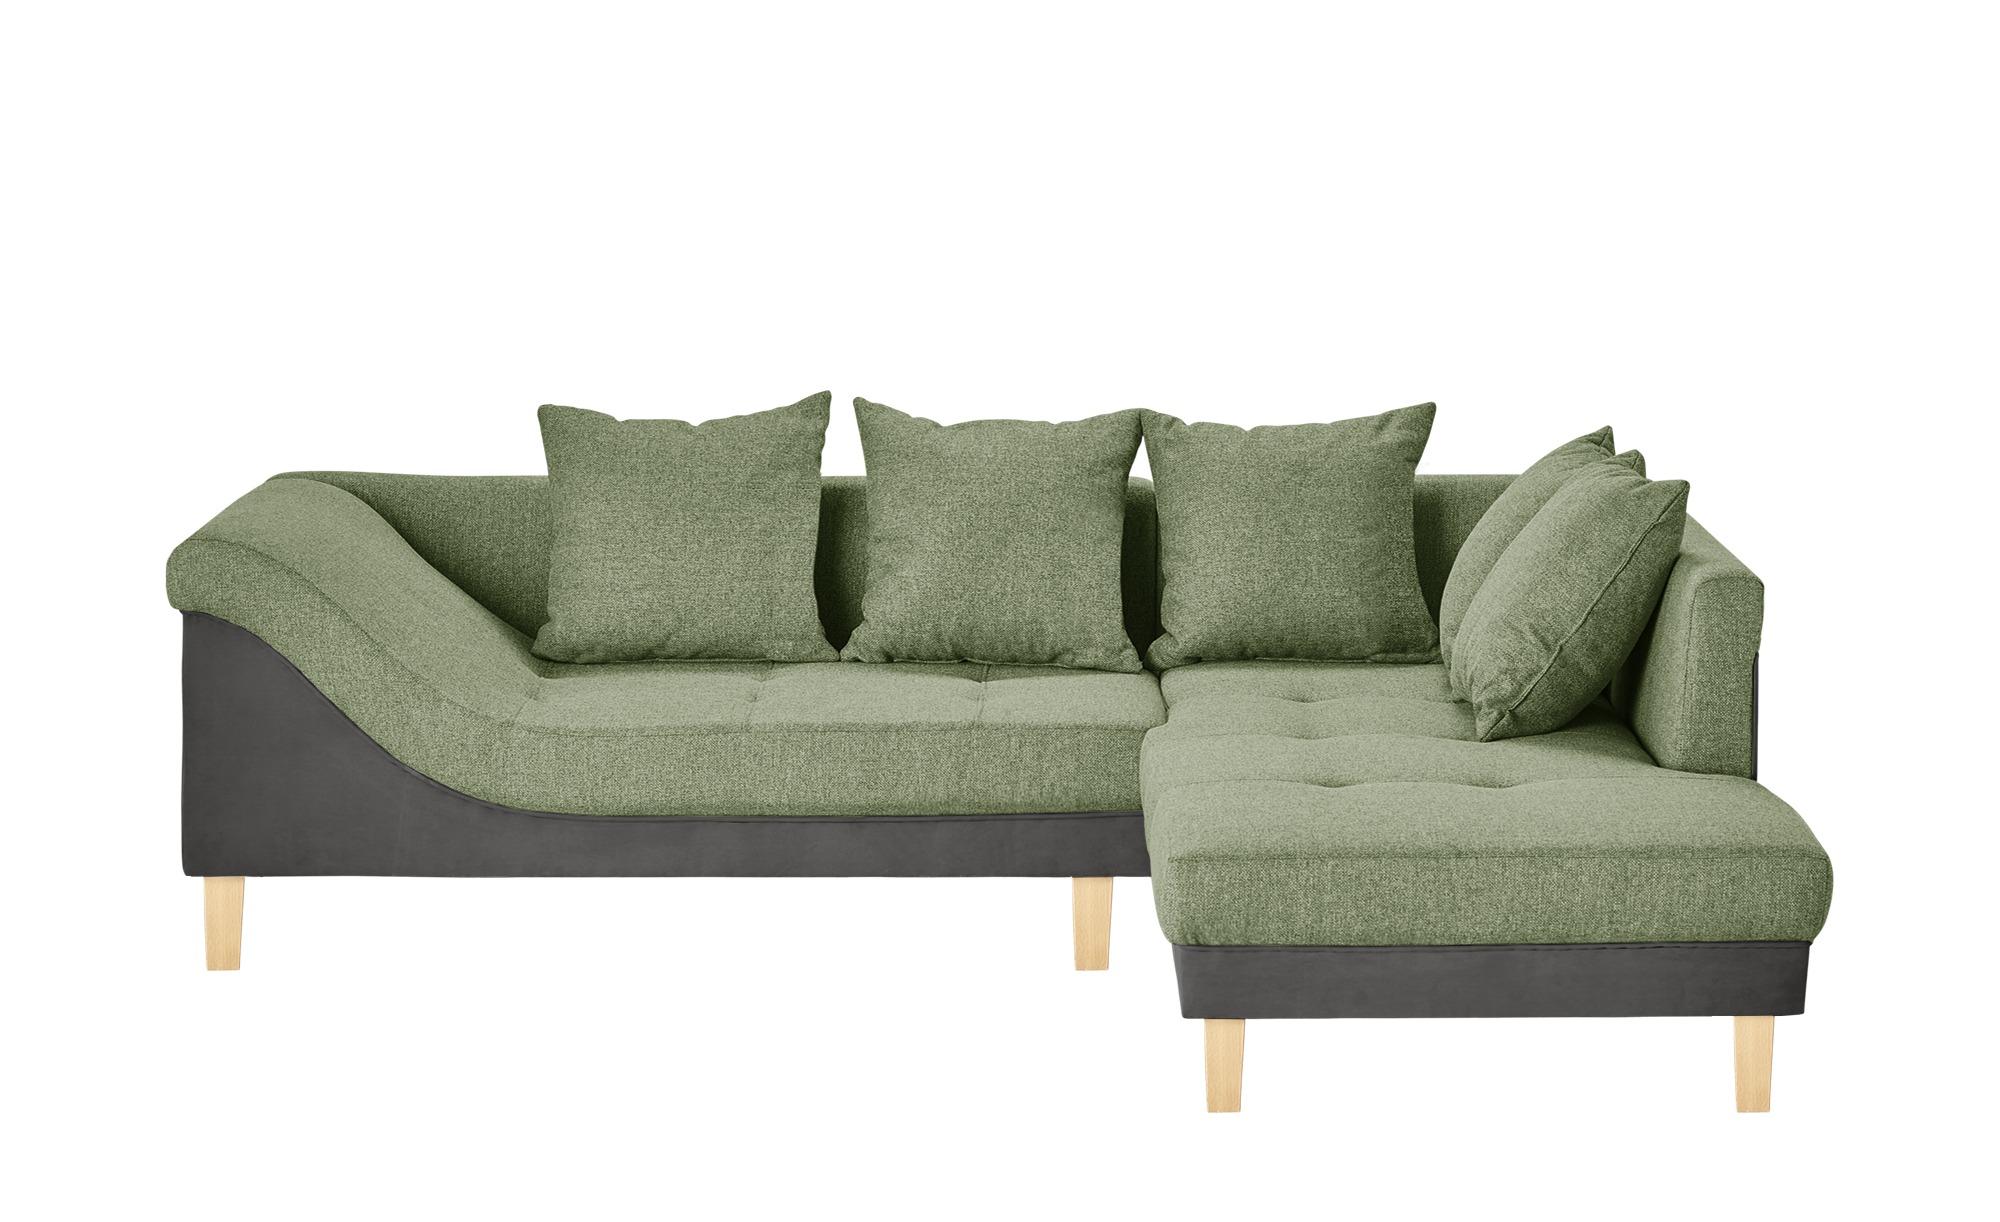 smart Ecksofa   Rita ¦ grün ¦ Maße (cm): H: 86 Polstermöbel > Sofas > Ecksofas - Höffner